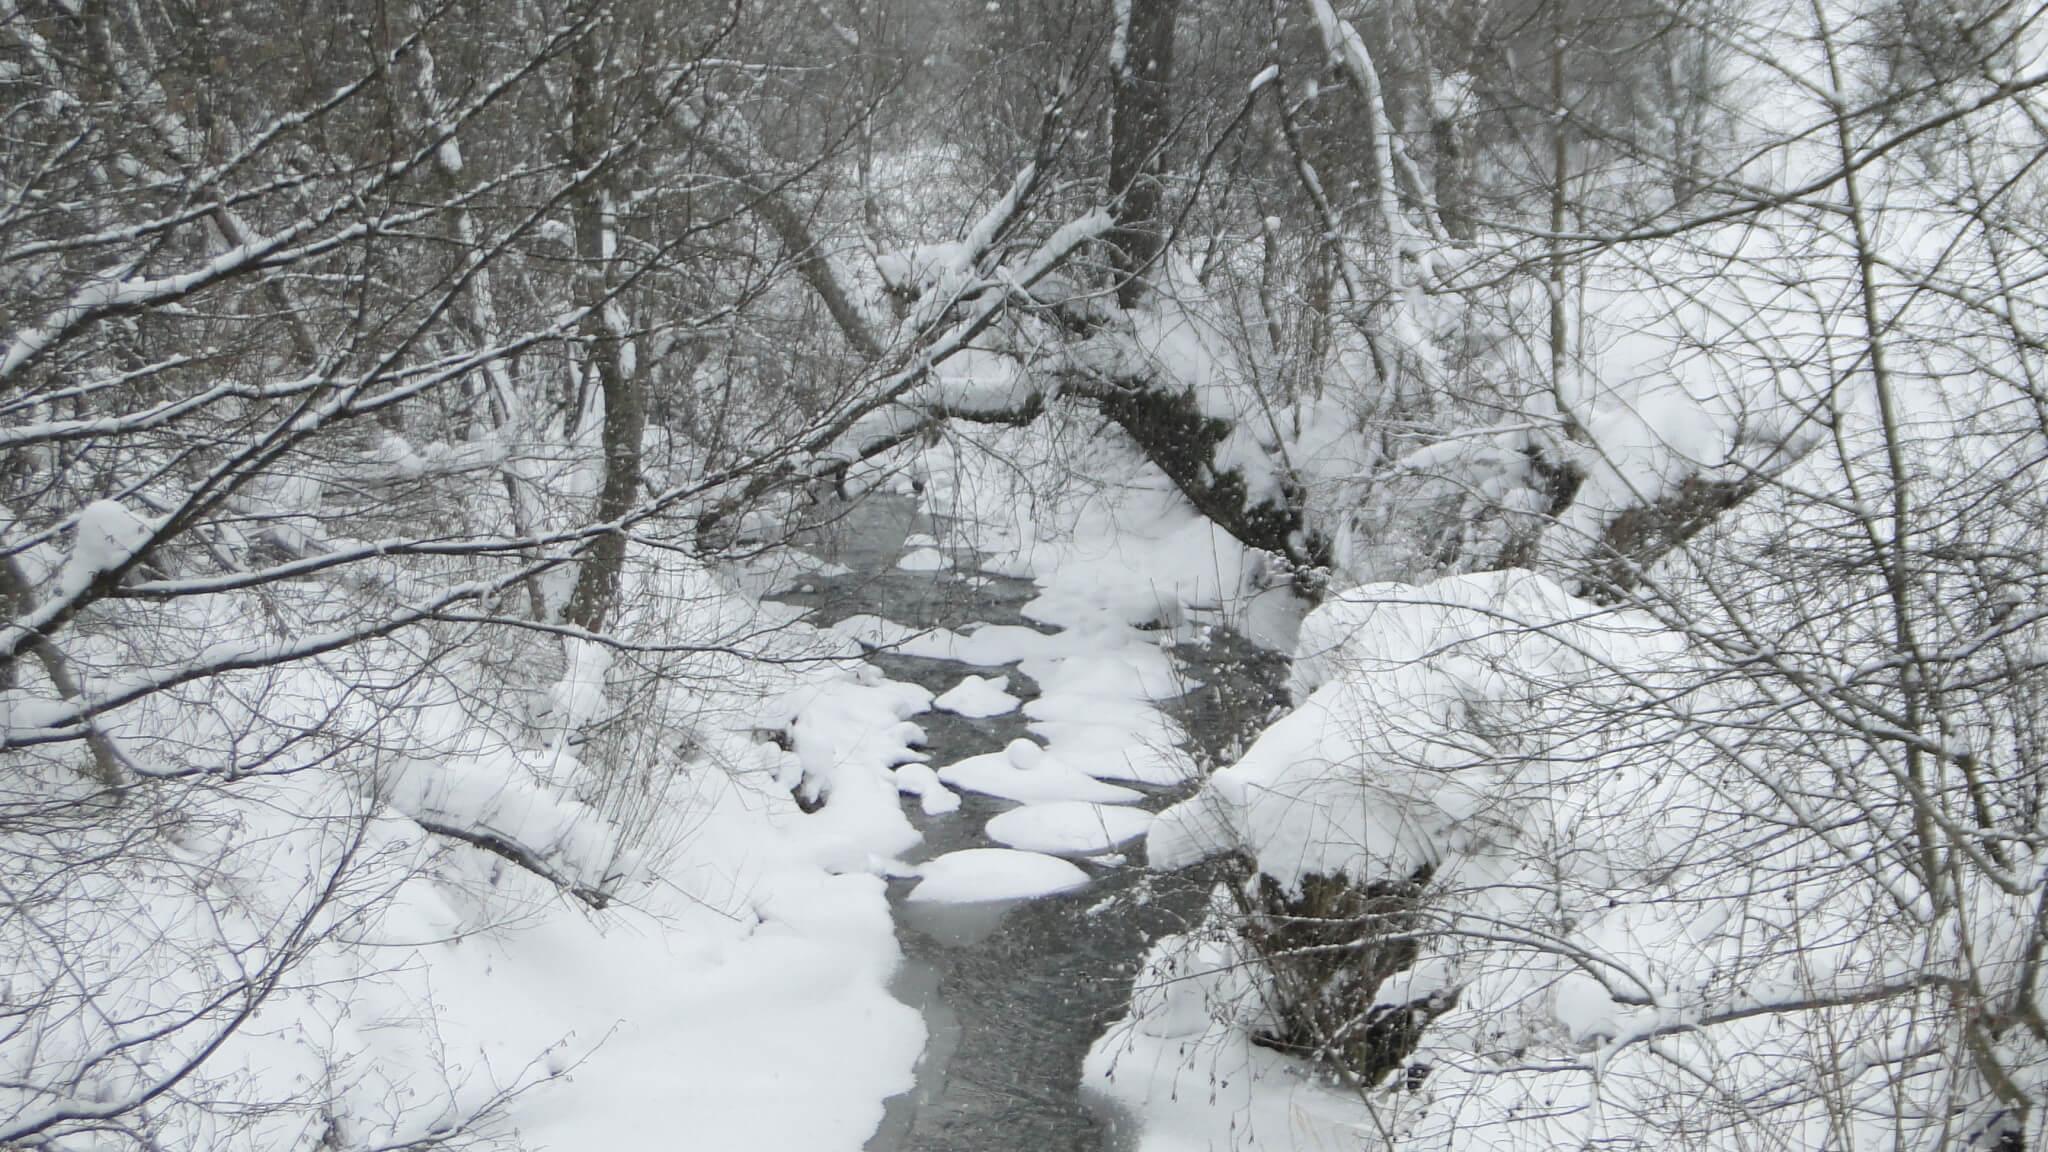 Śnieg,  śnieg, śnieg!... 4